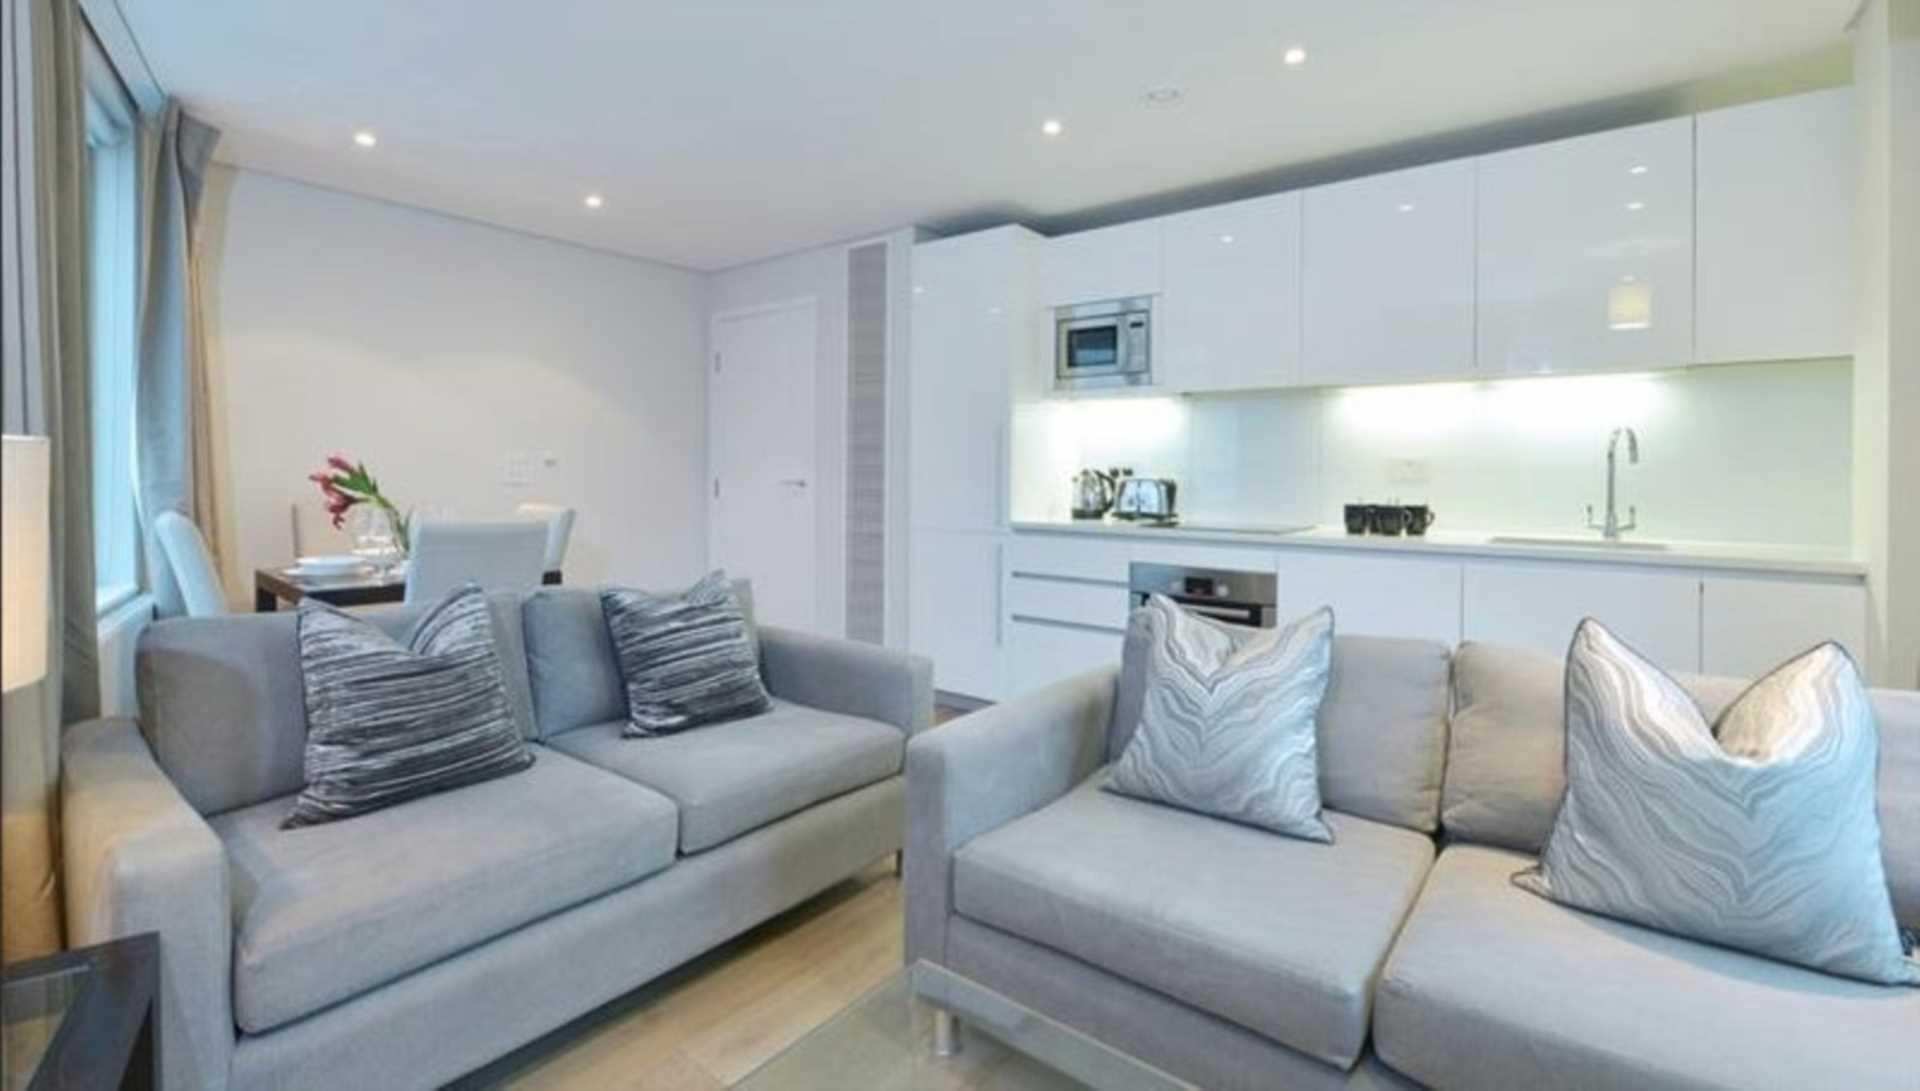 2 Bedroom Flat To Rent Merchant Square East Harbet Road Paddington London W2 1an